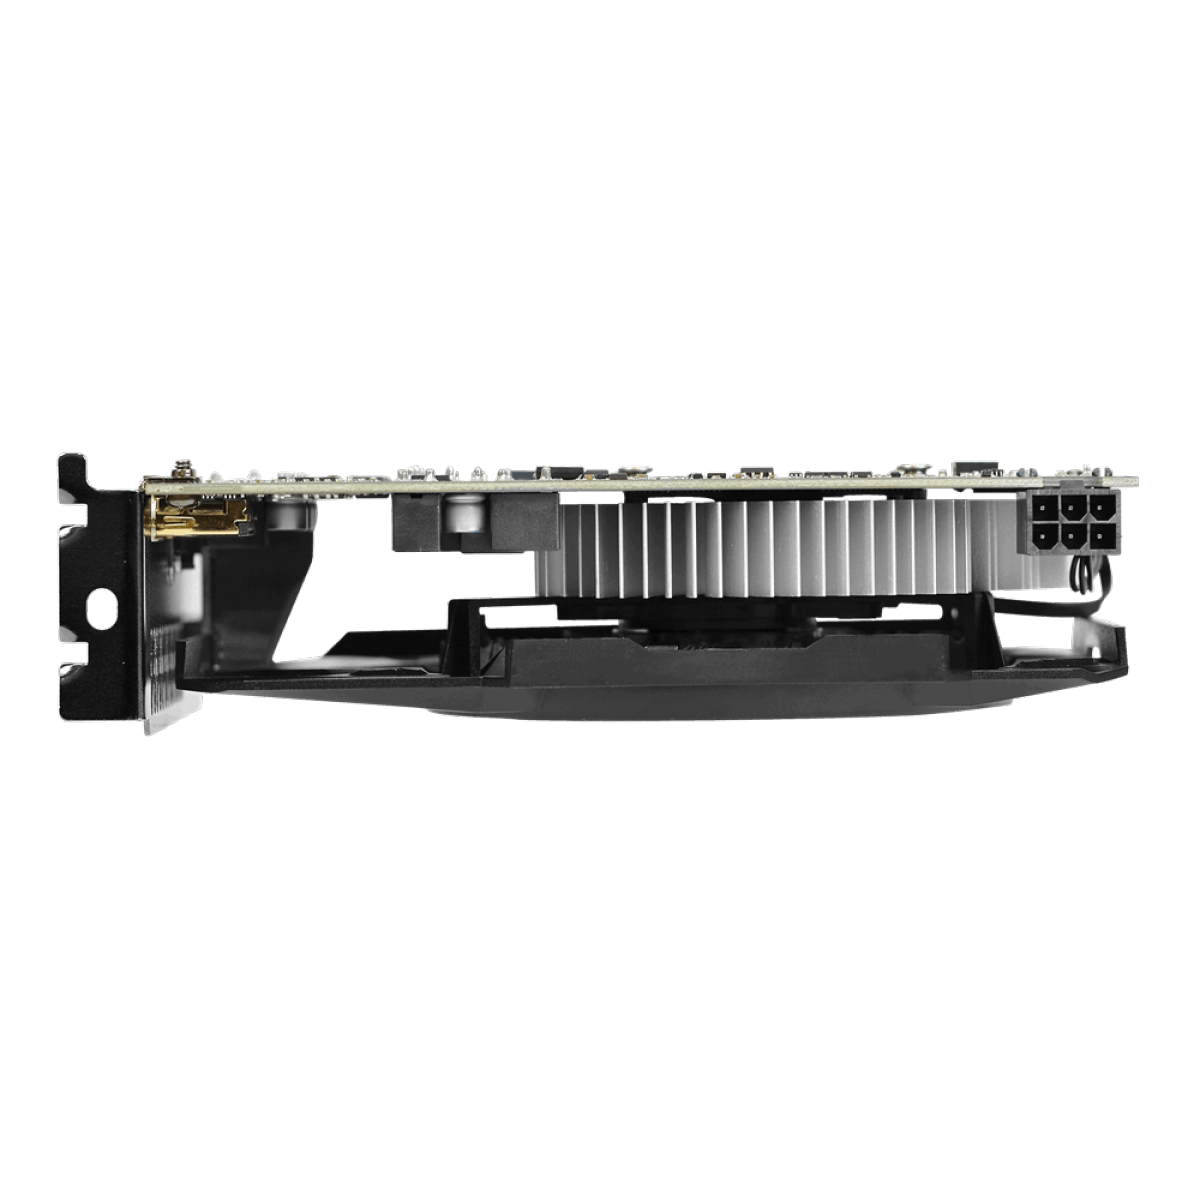 Placa de Vídeo Gigabyte Radeon R7 360, 2GB, GDDR5, 128bit, GV-R736OC-2GD